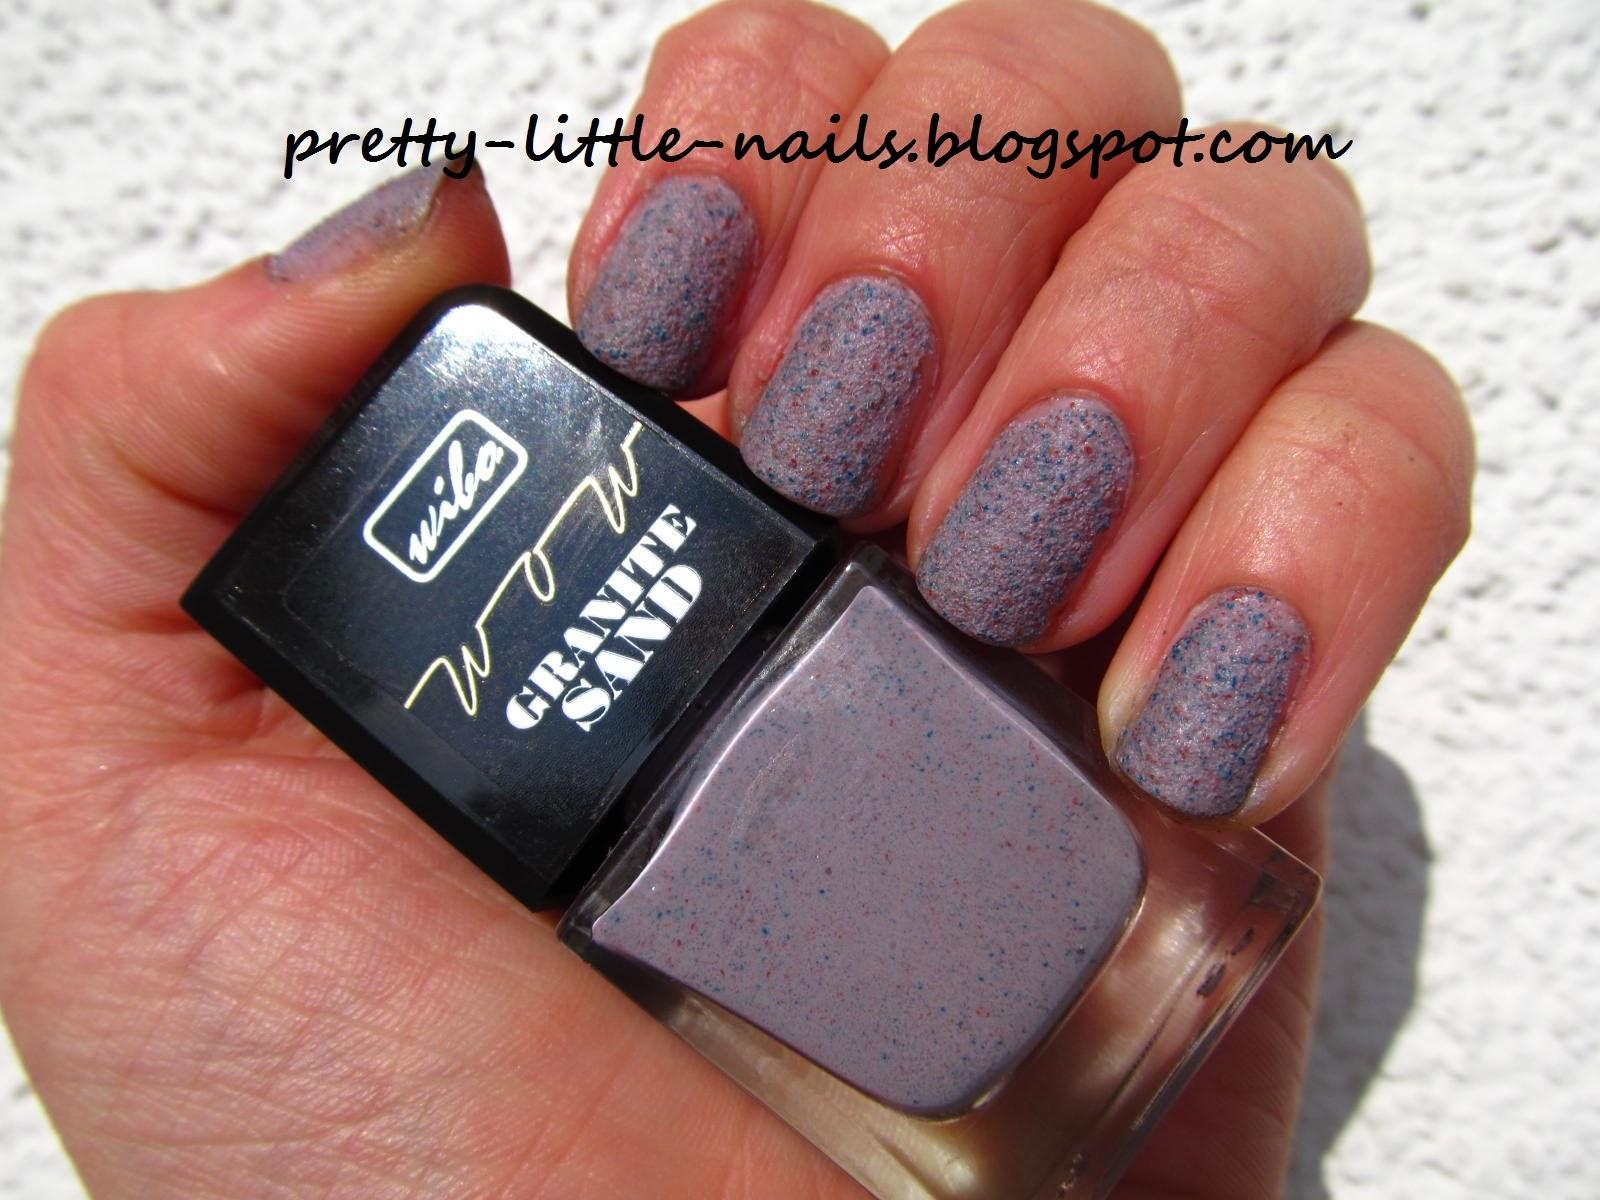 Pretty Little Nails:)